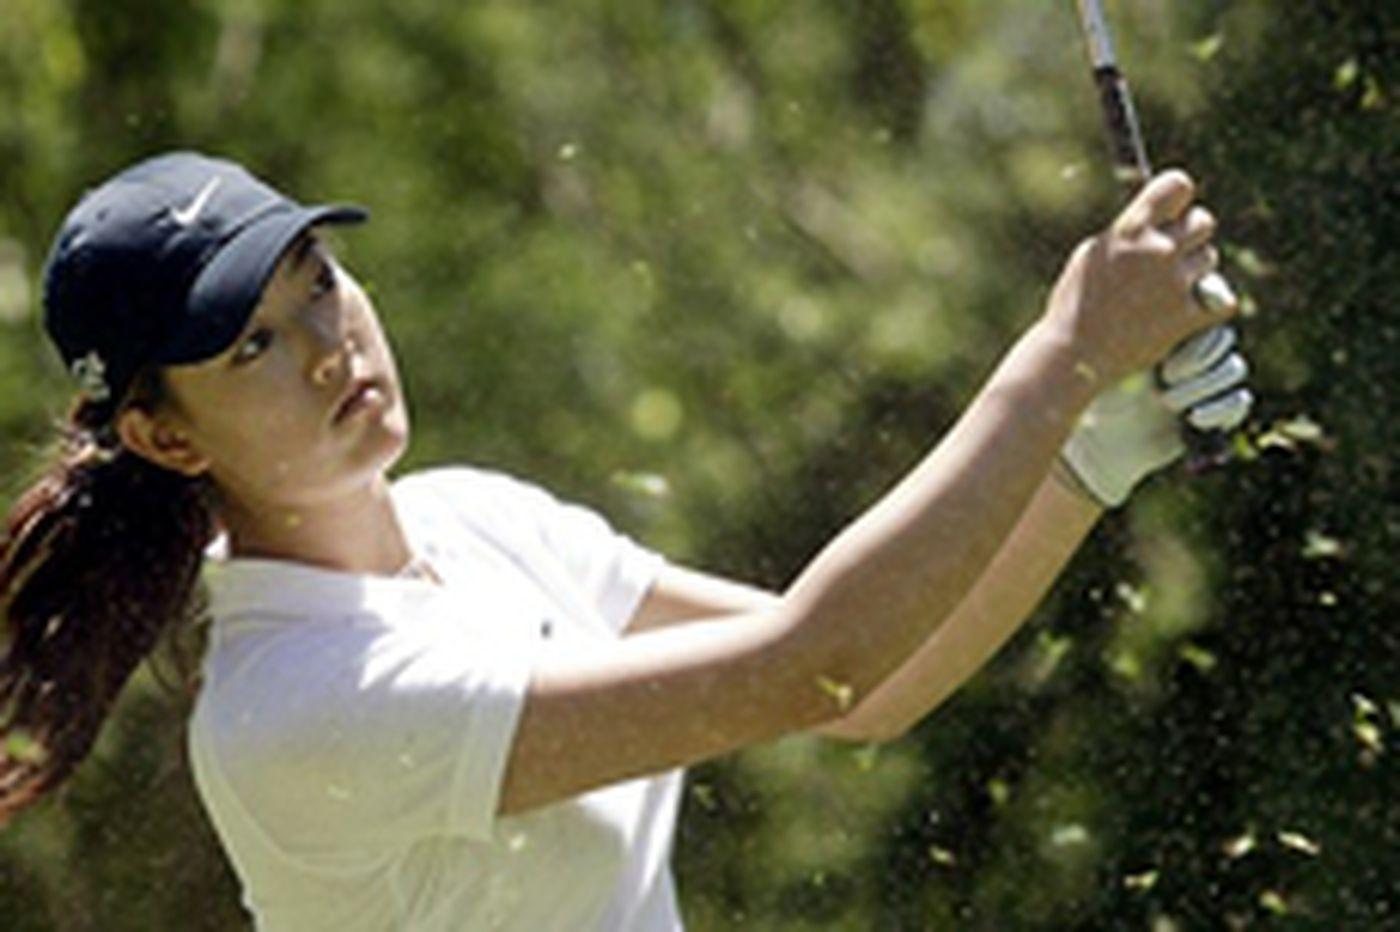 On Golf | Returning from injury